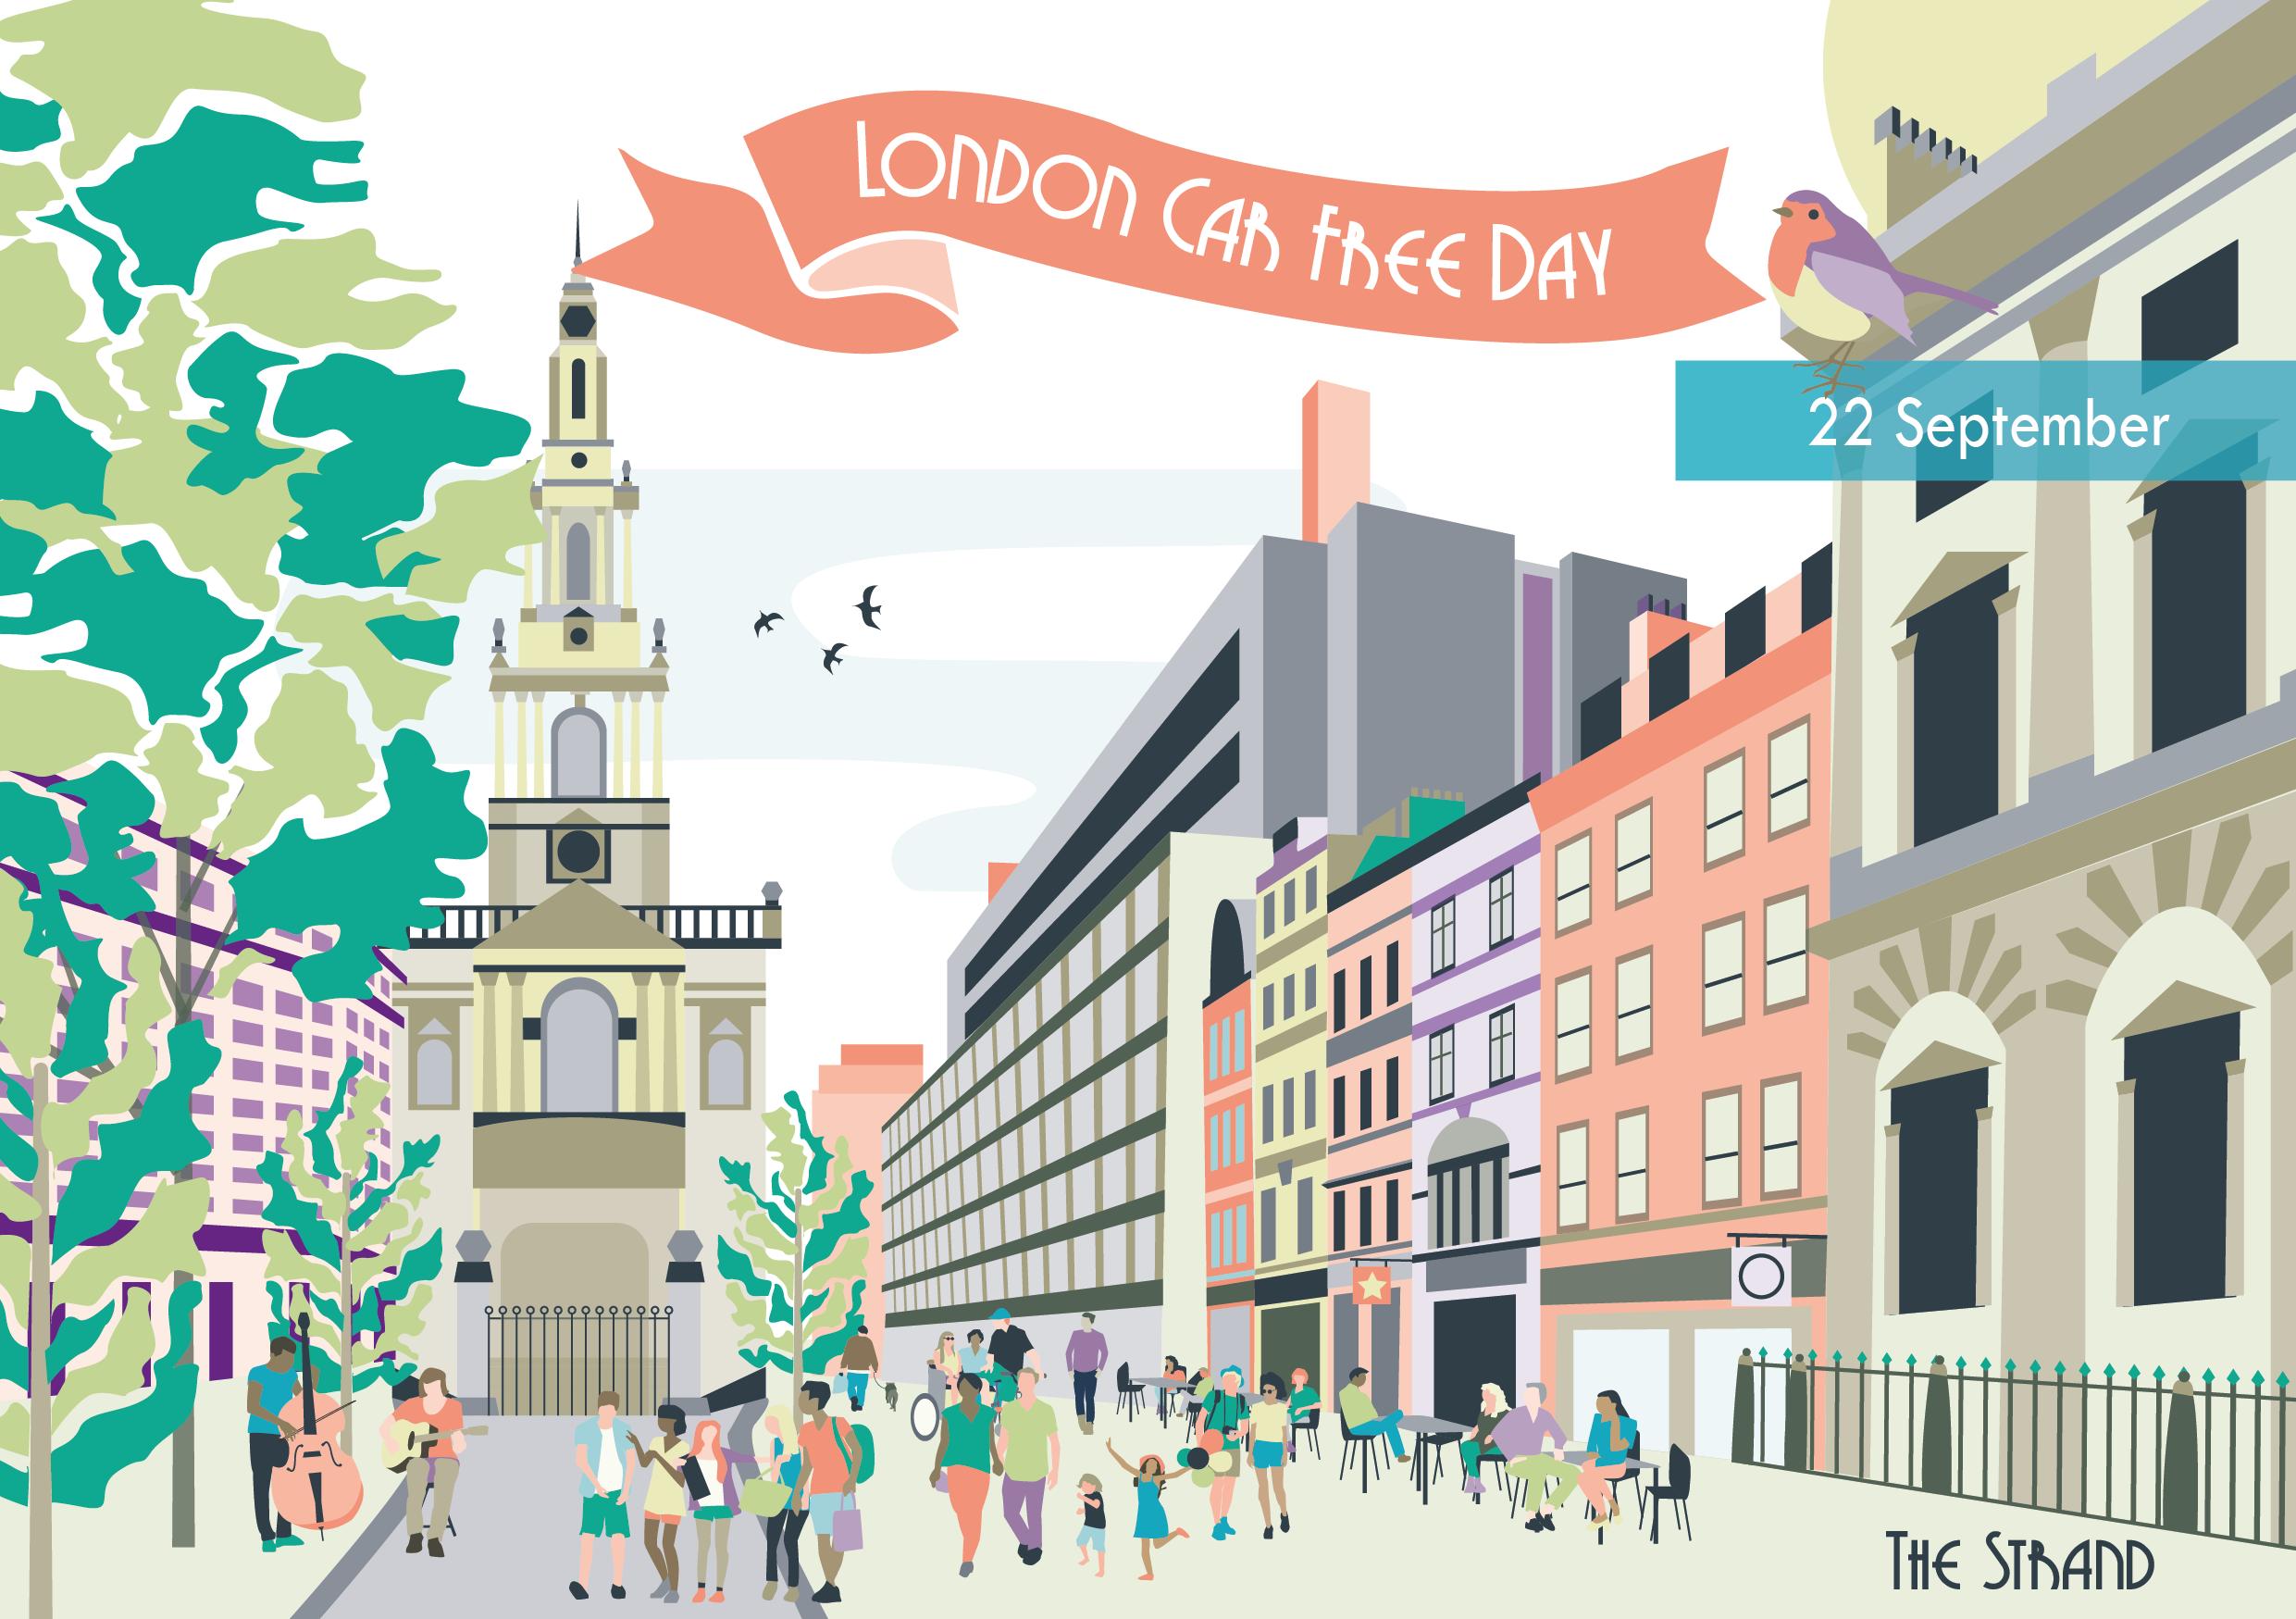 london_car_free_day_Postcards_7_Print-04.png